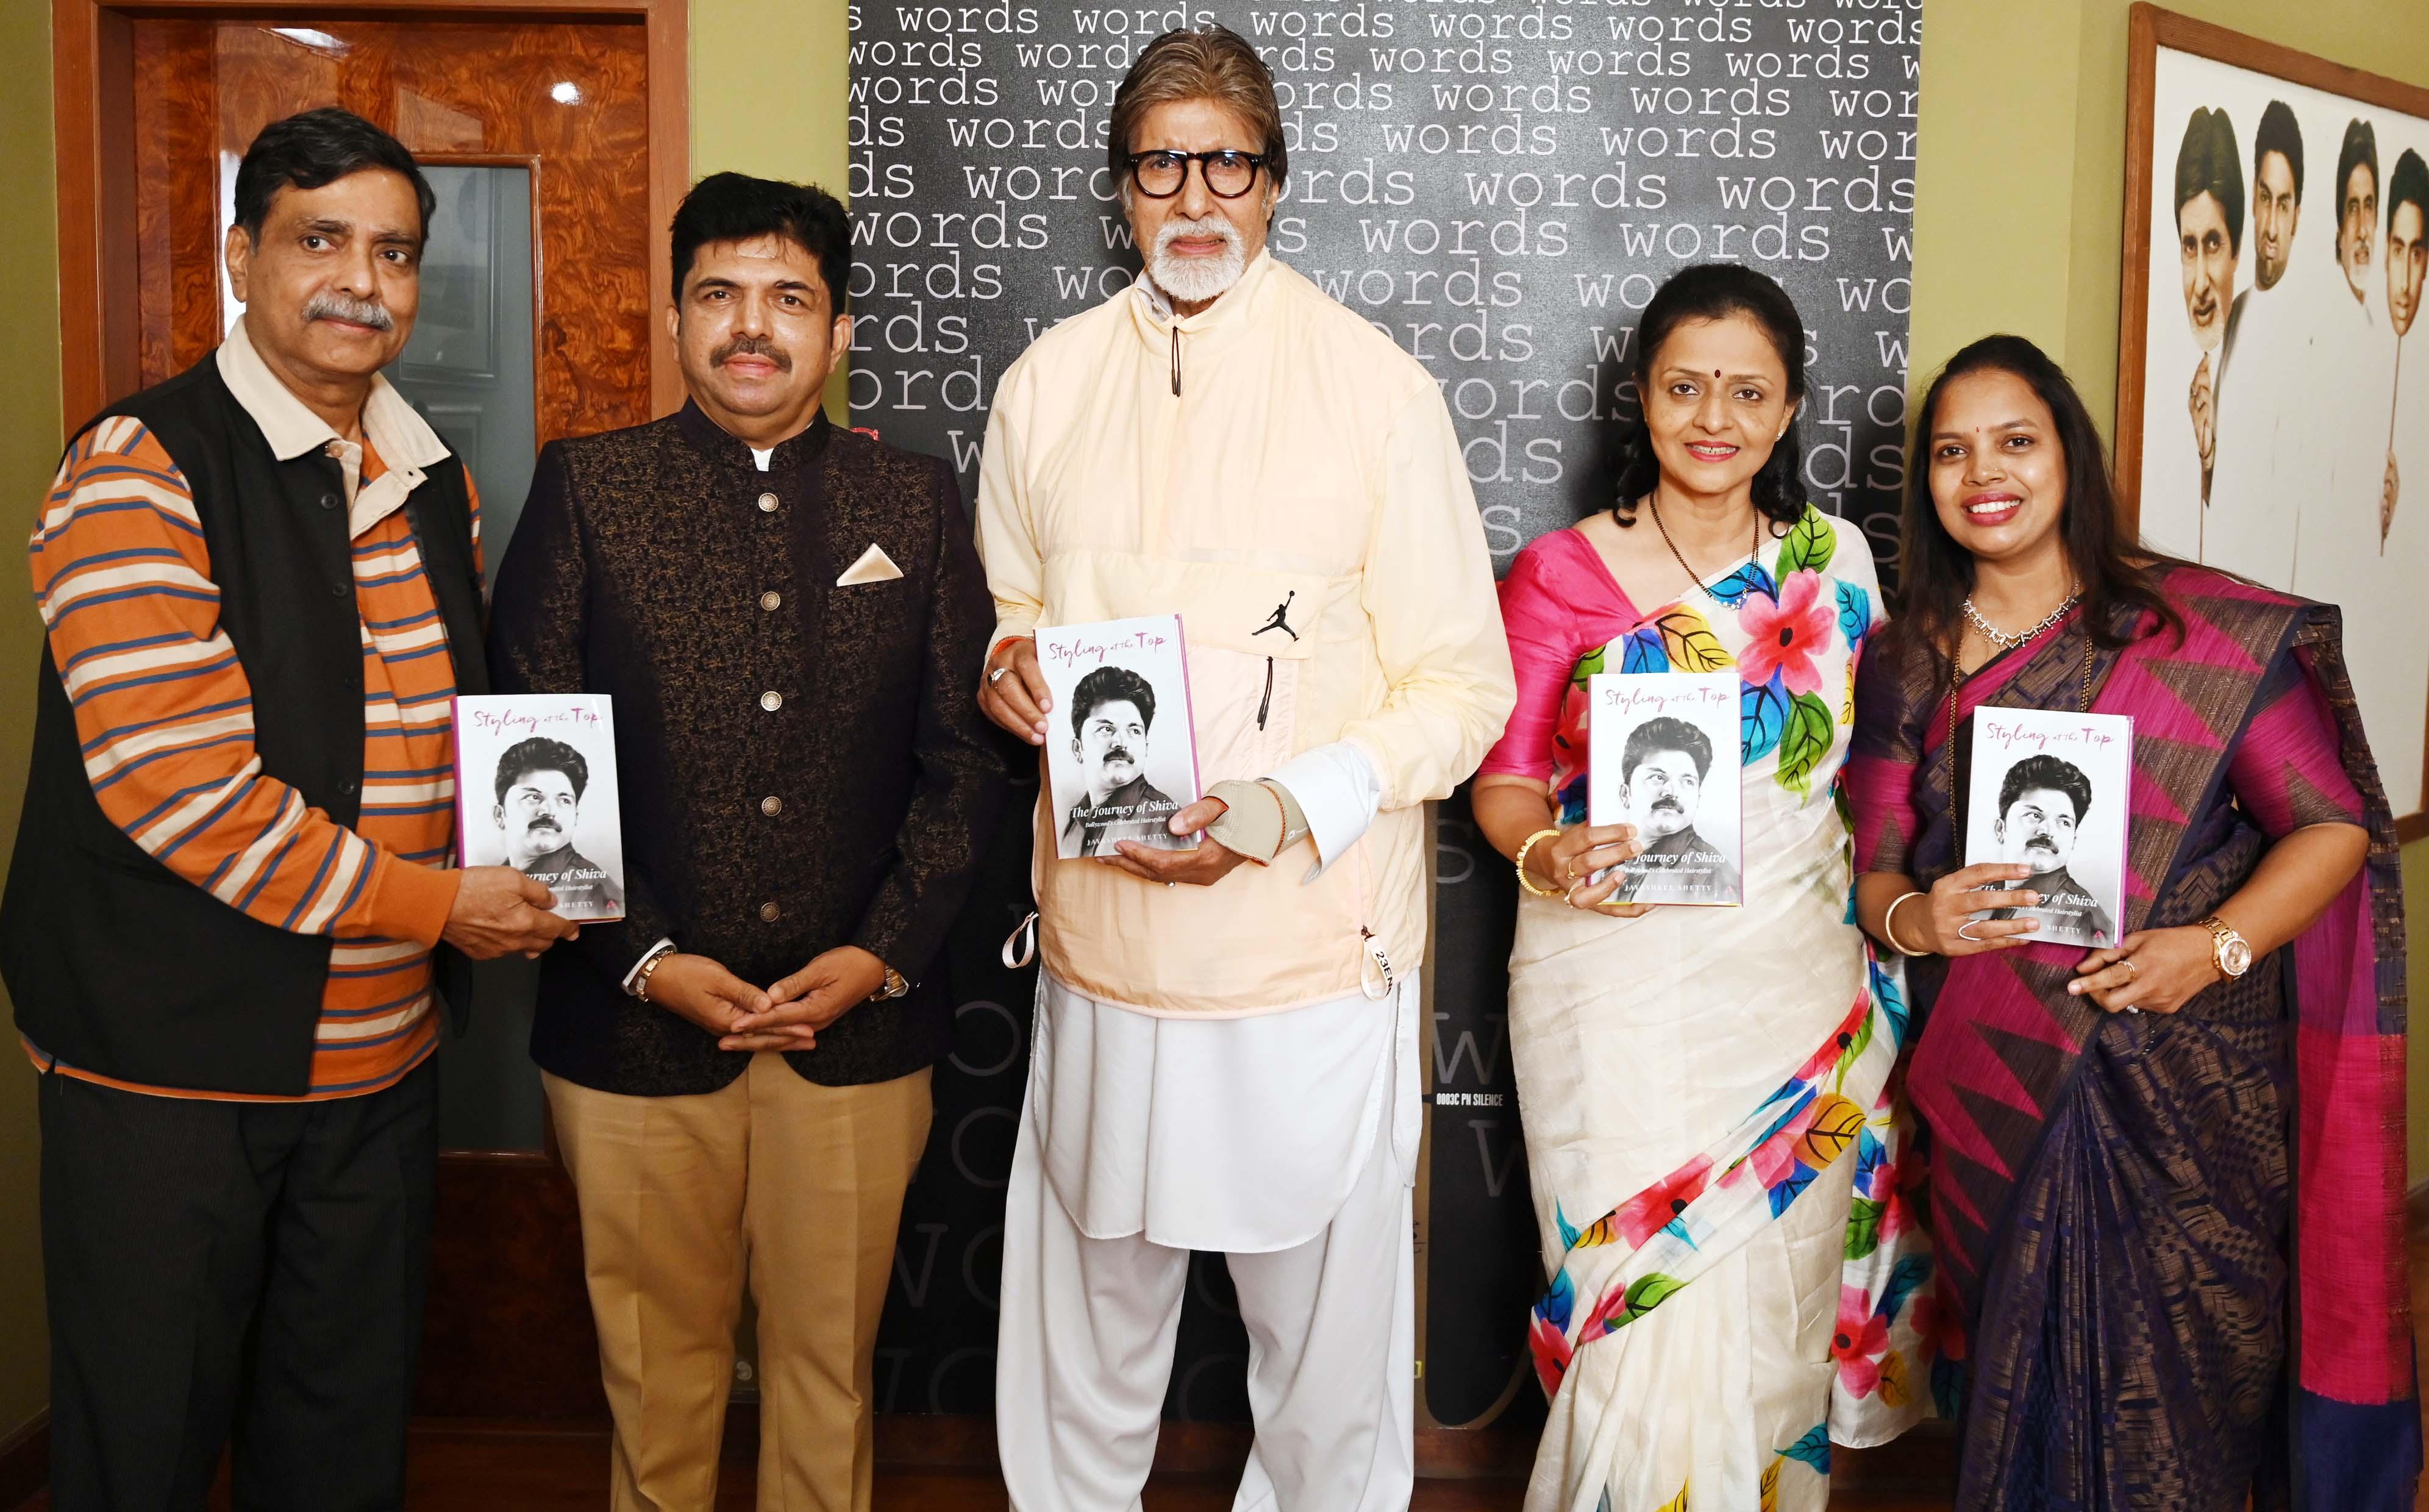 Amitabh Bachchan releases memoir of top Mumbai hairstylist Shivarama Bhandary